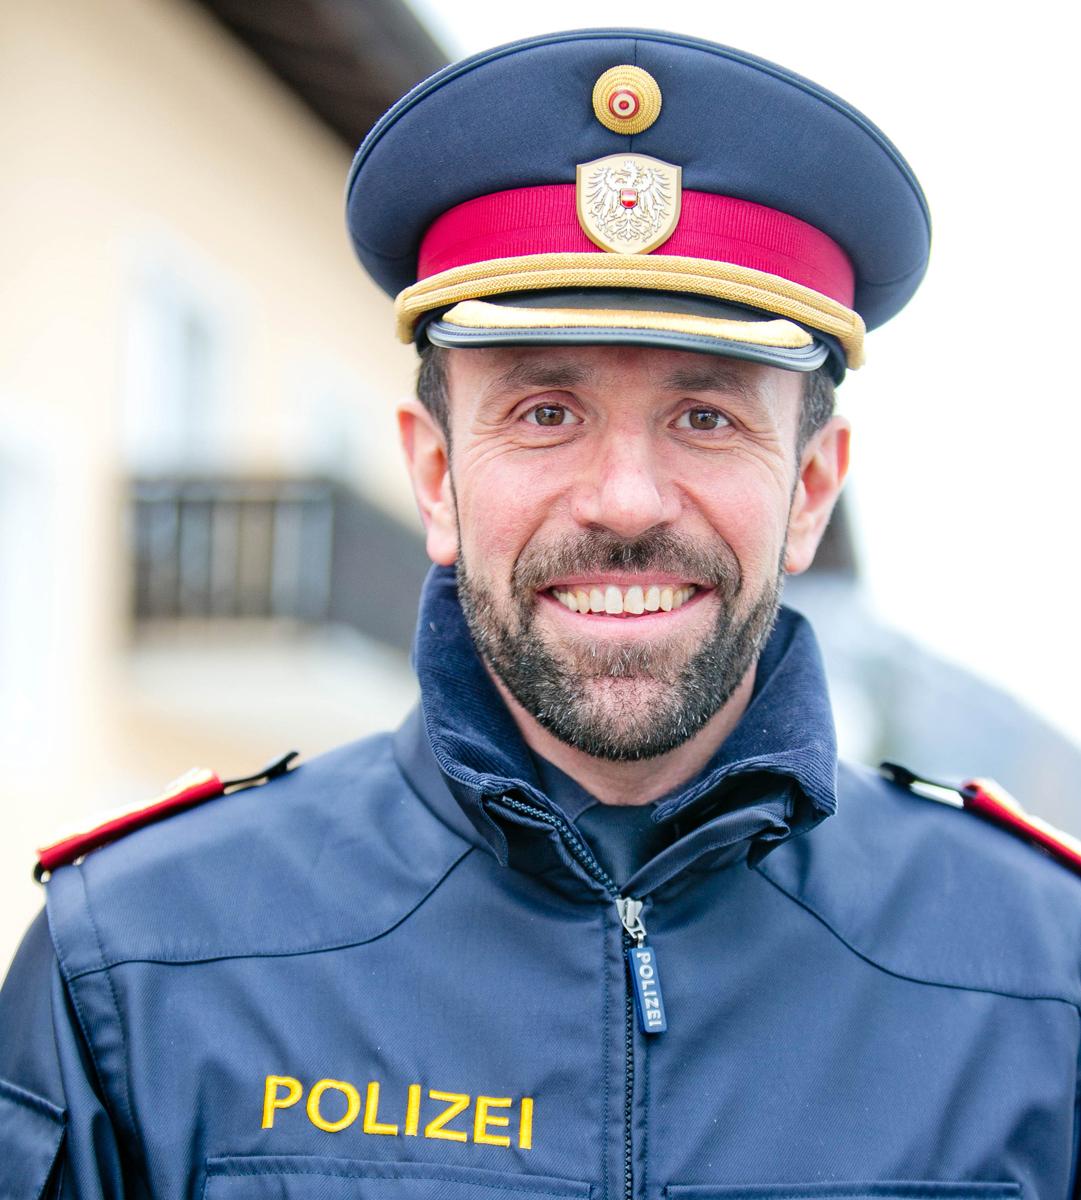 Landespolizeidirektor Dr. Franz RUF, M.A.